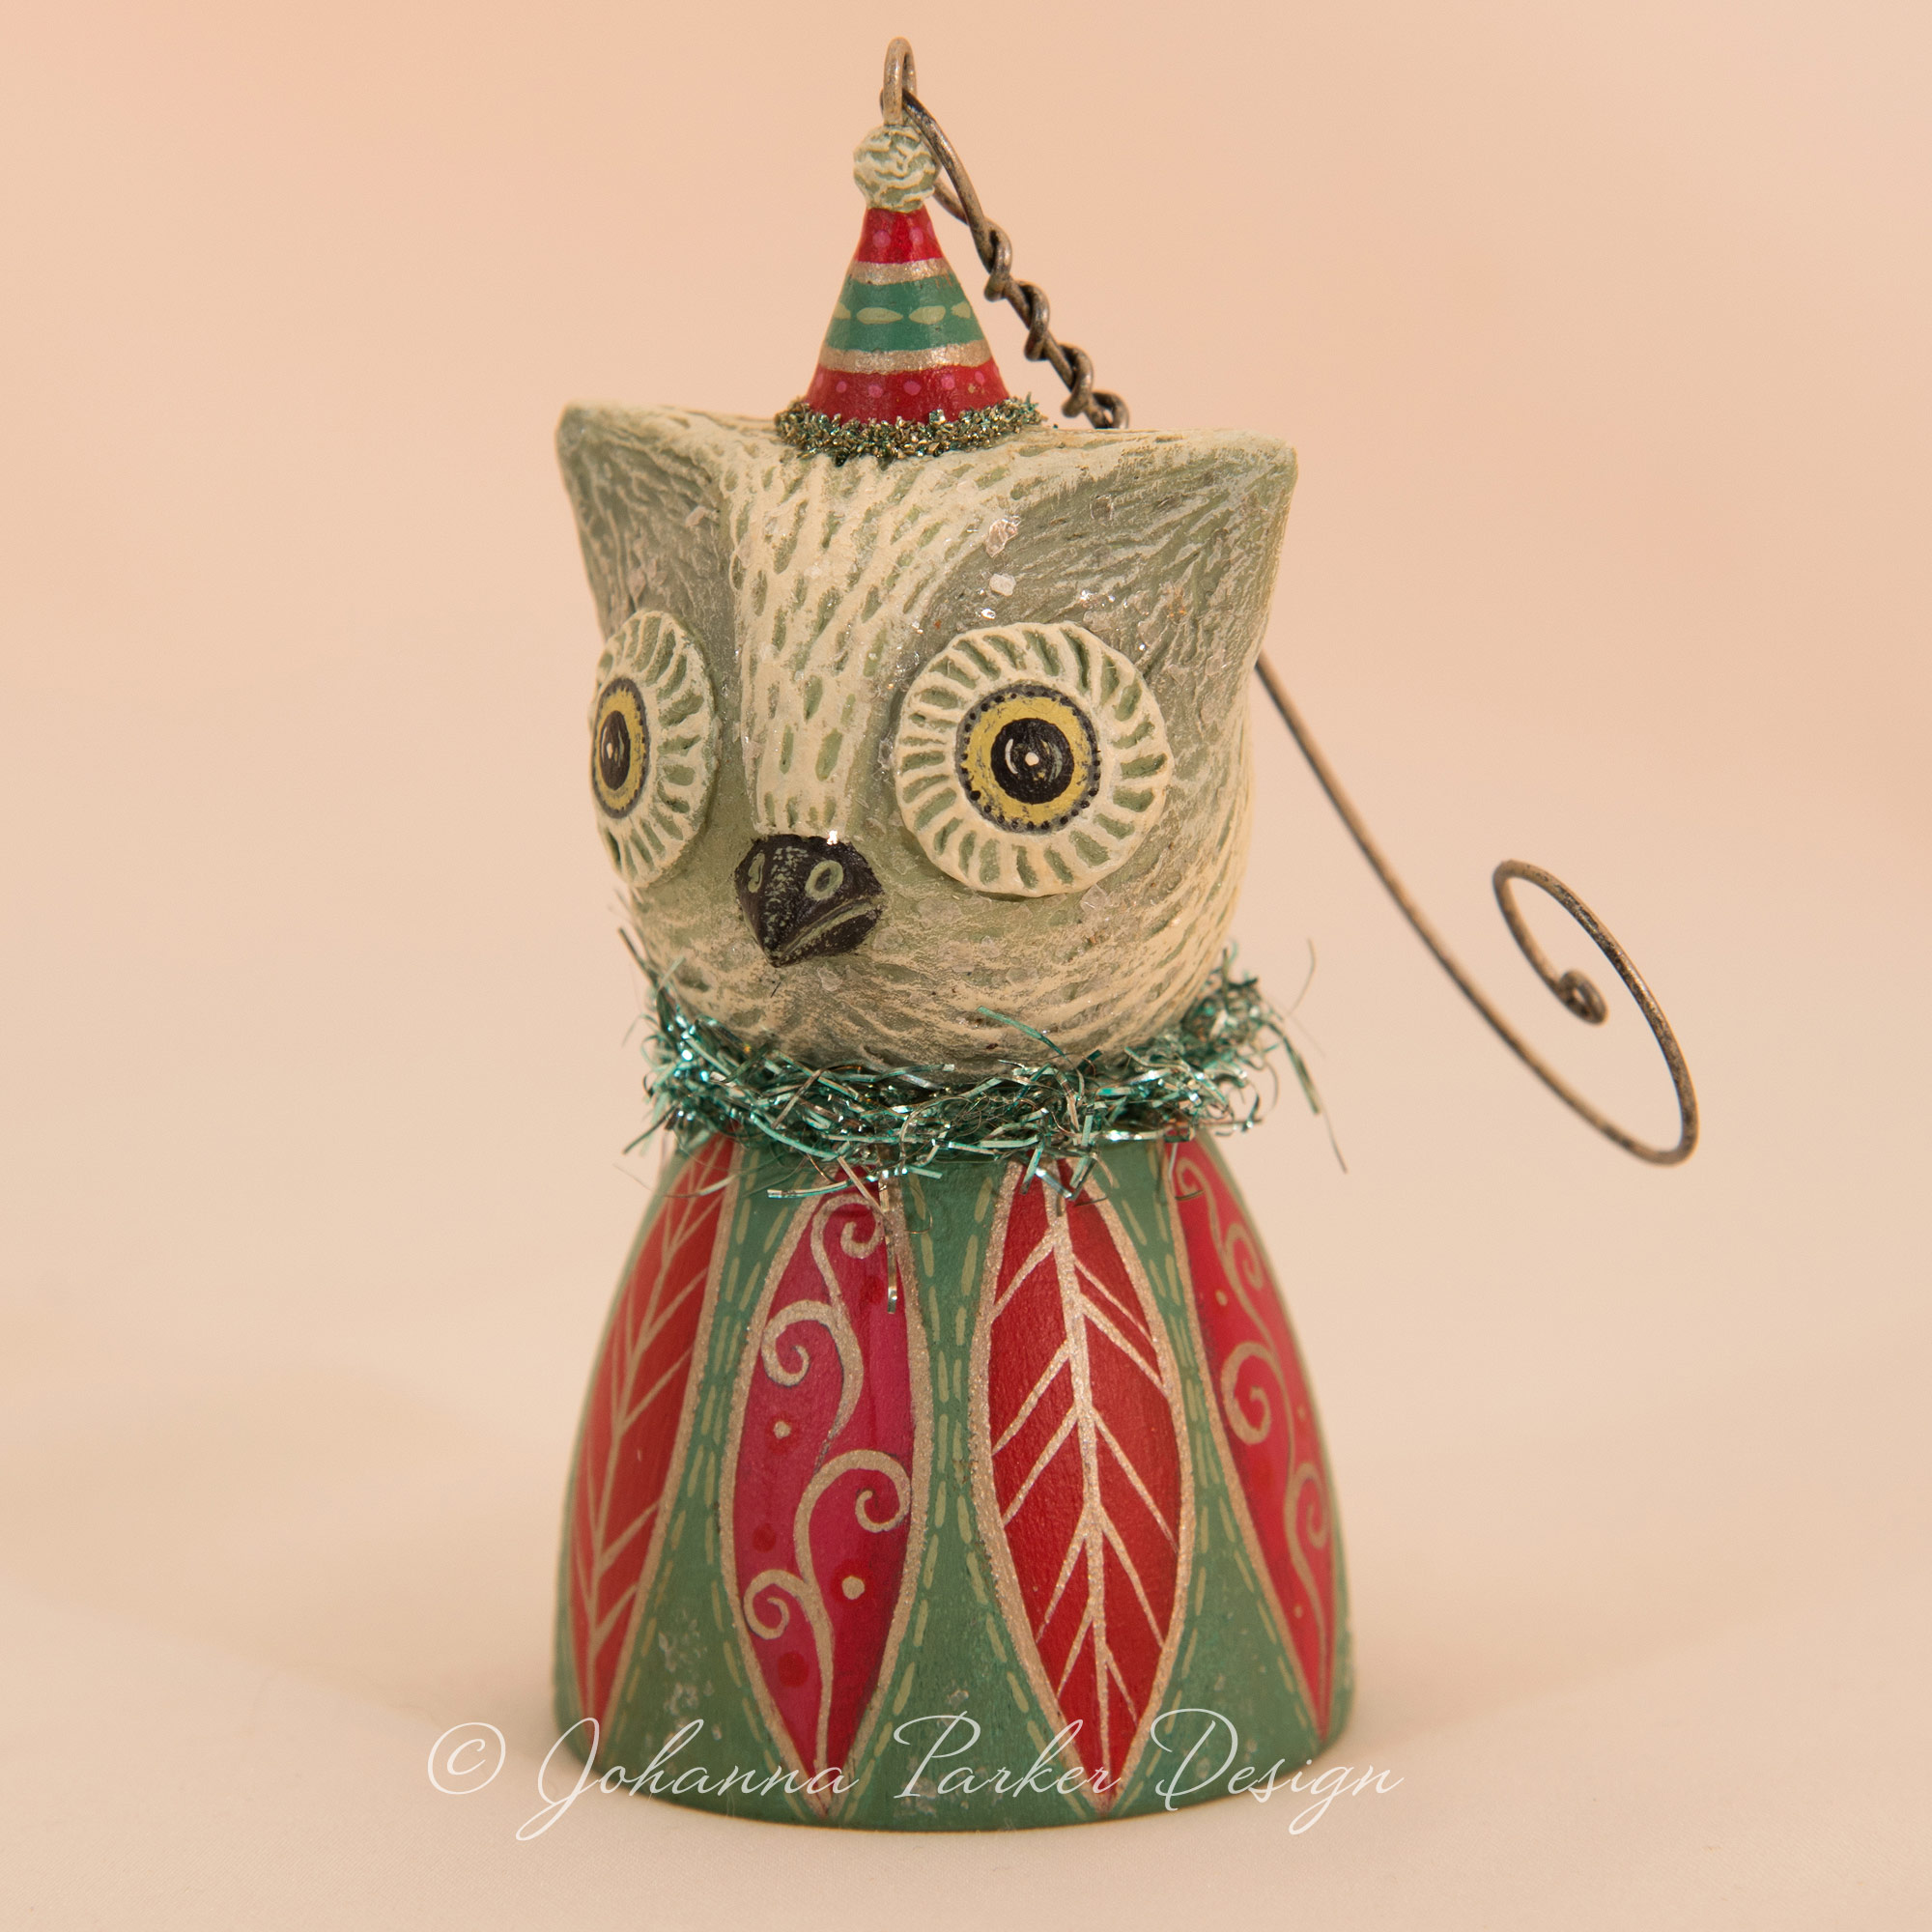 Johanna-Parker-Owl-Feathers-Bell-Ornament-6.jpg